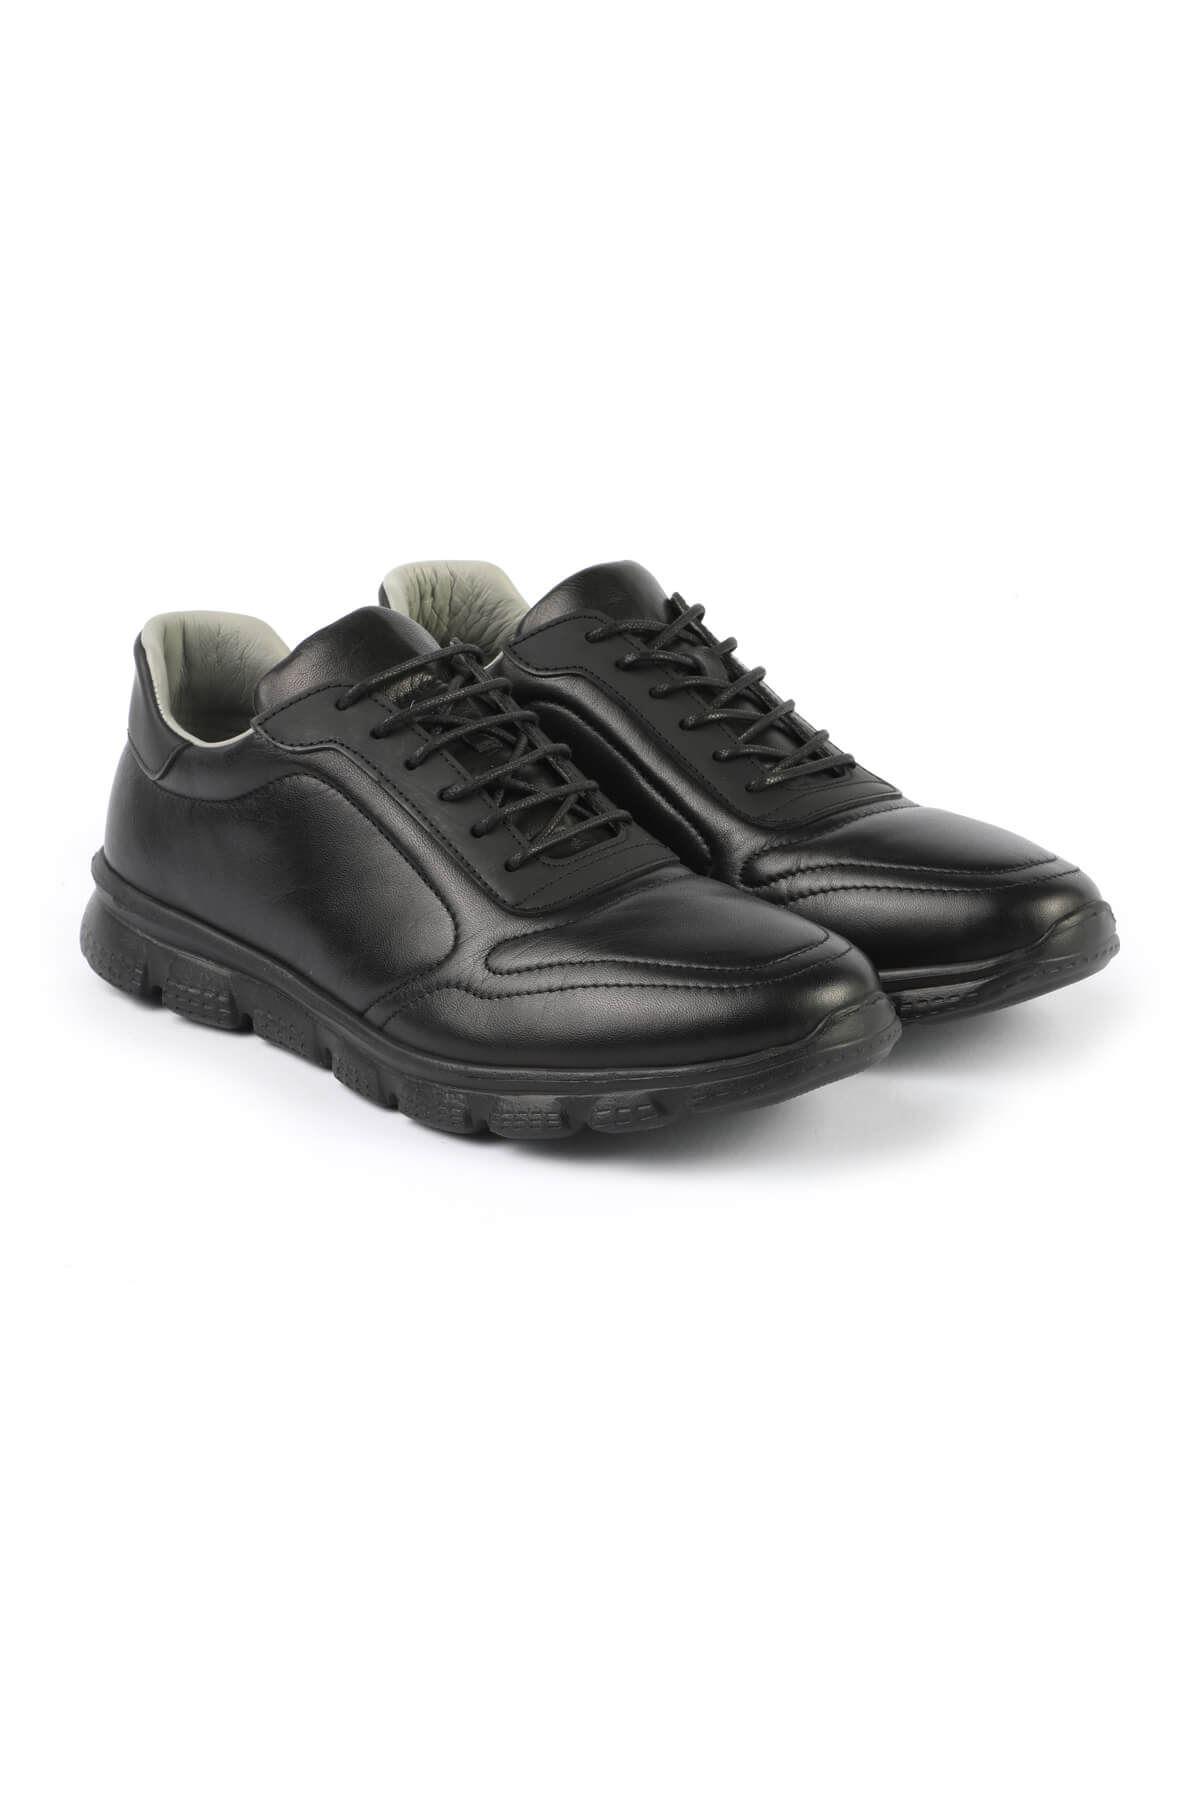 Libero 3121 Black Sports Shoes